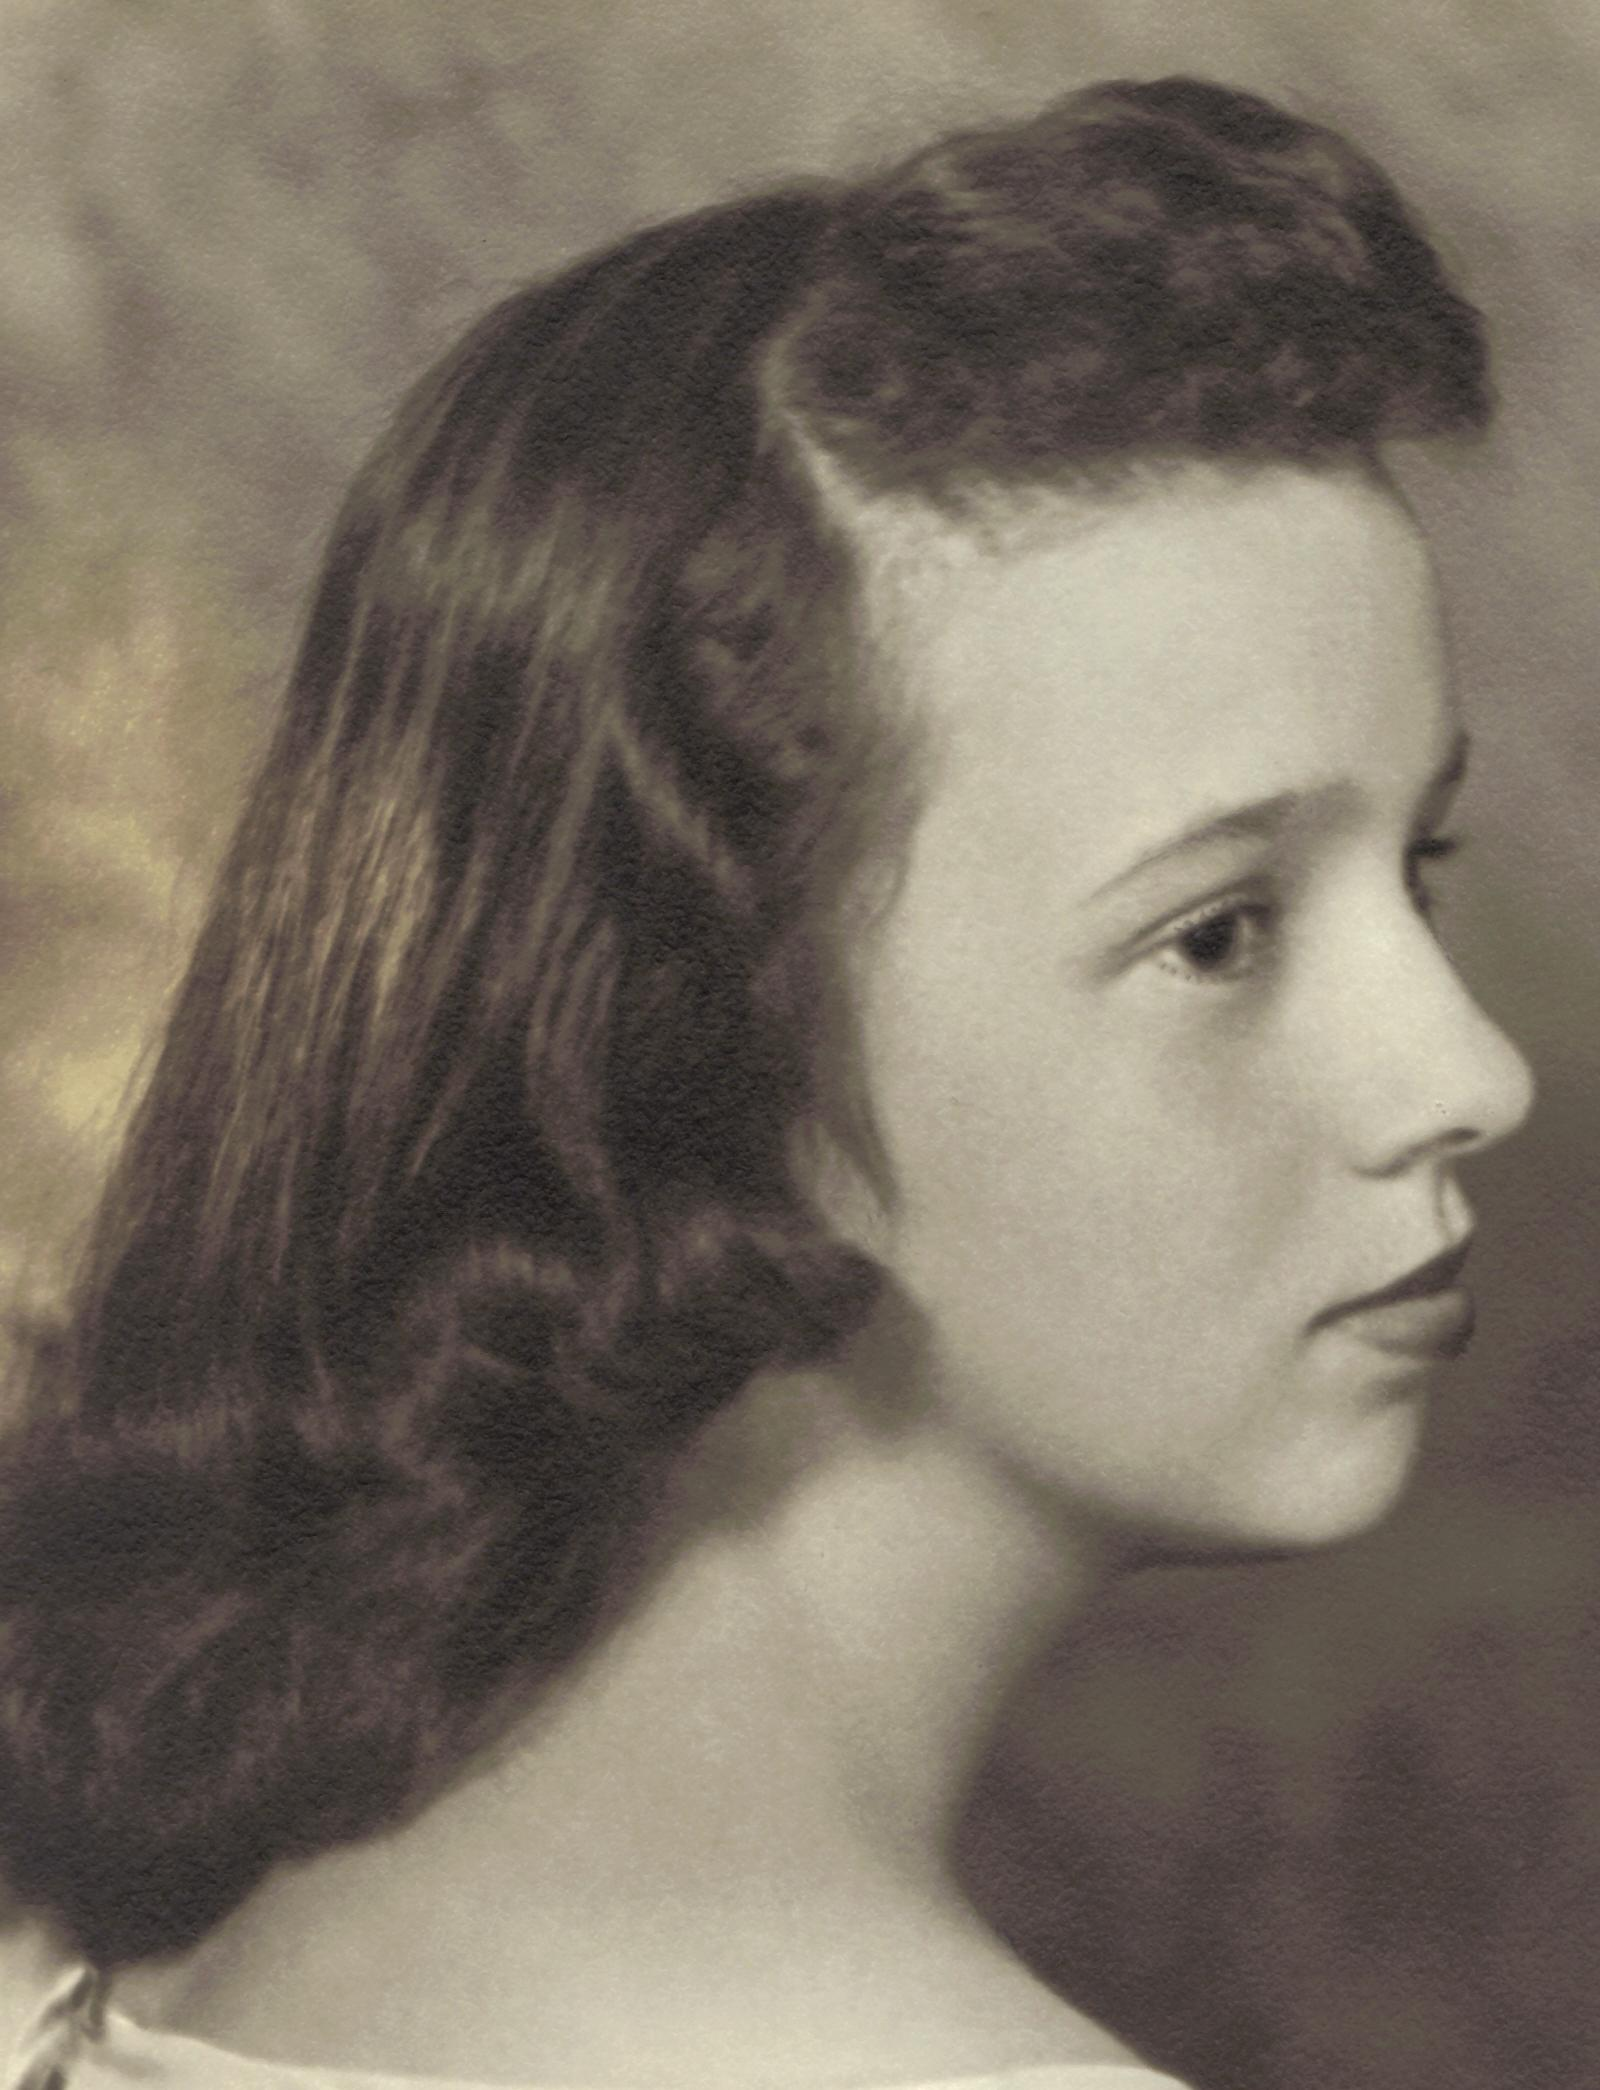 Carver-Govenides, Linda '60